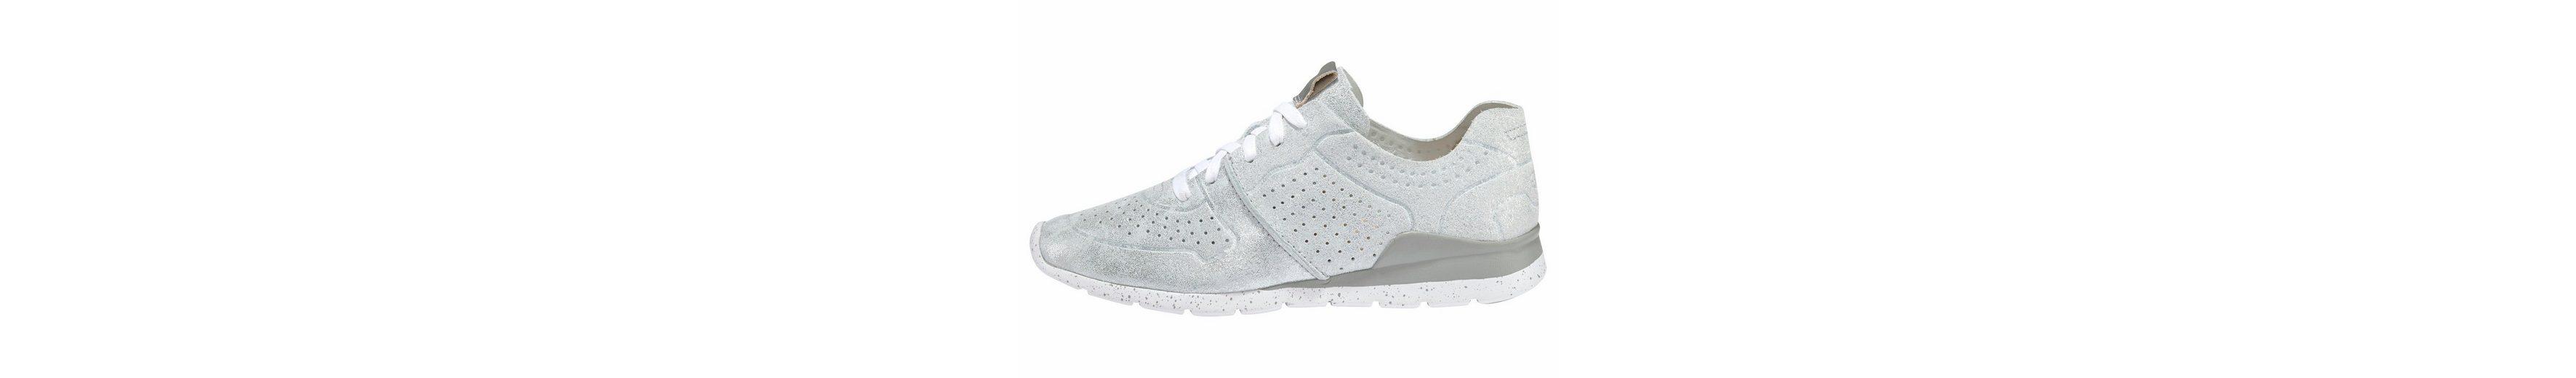 UGG Tye Stardust Sneaker, im trendy Metallic-Look